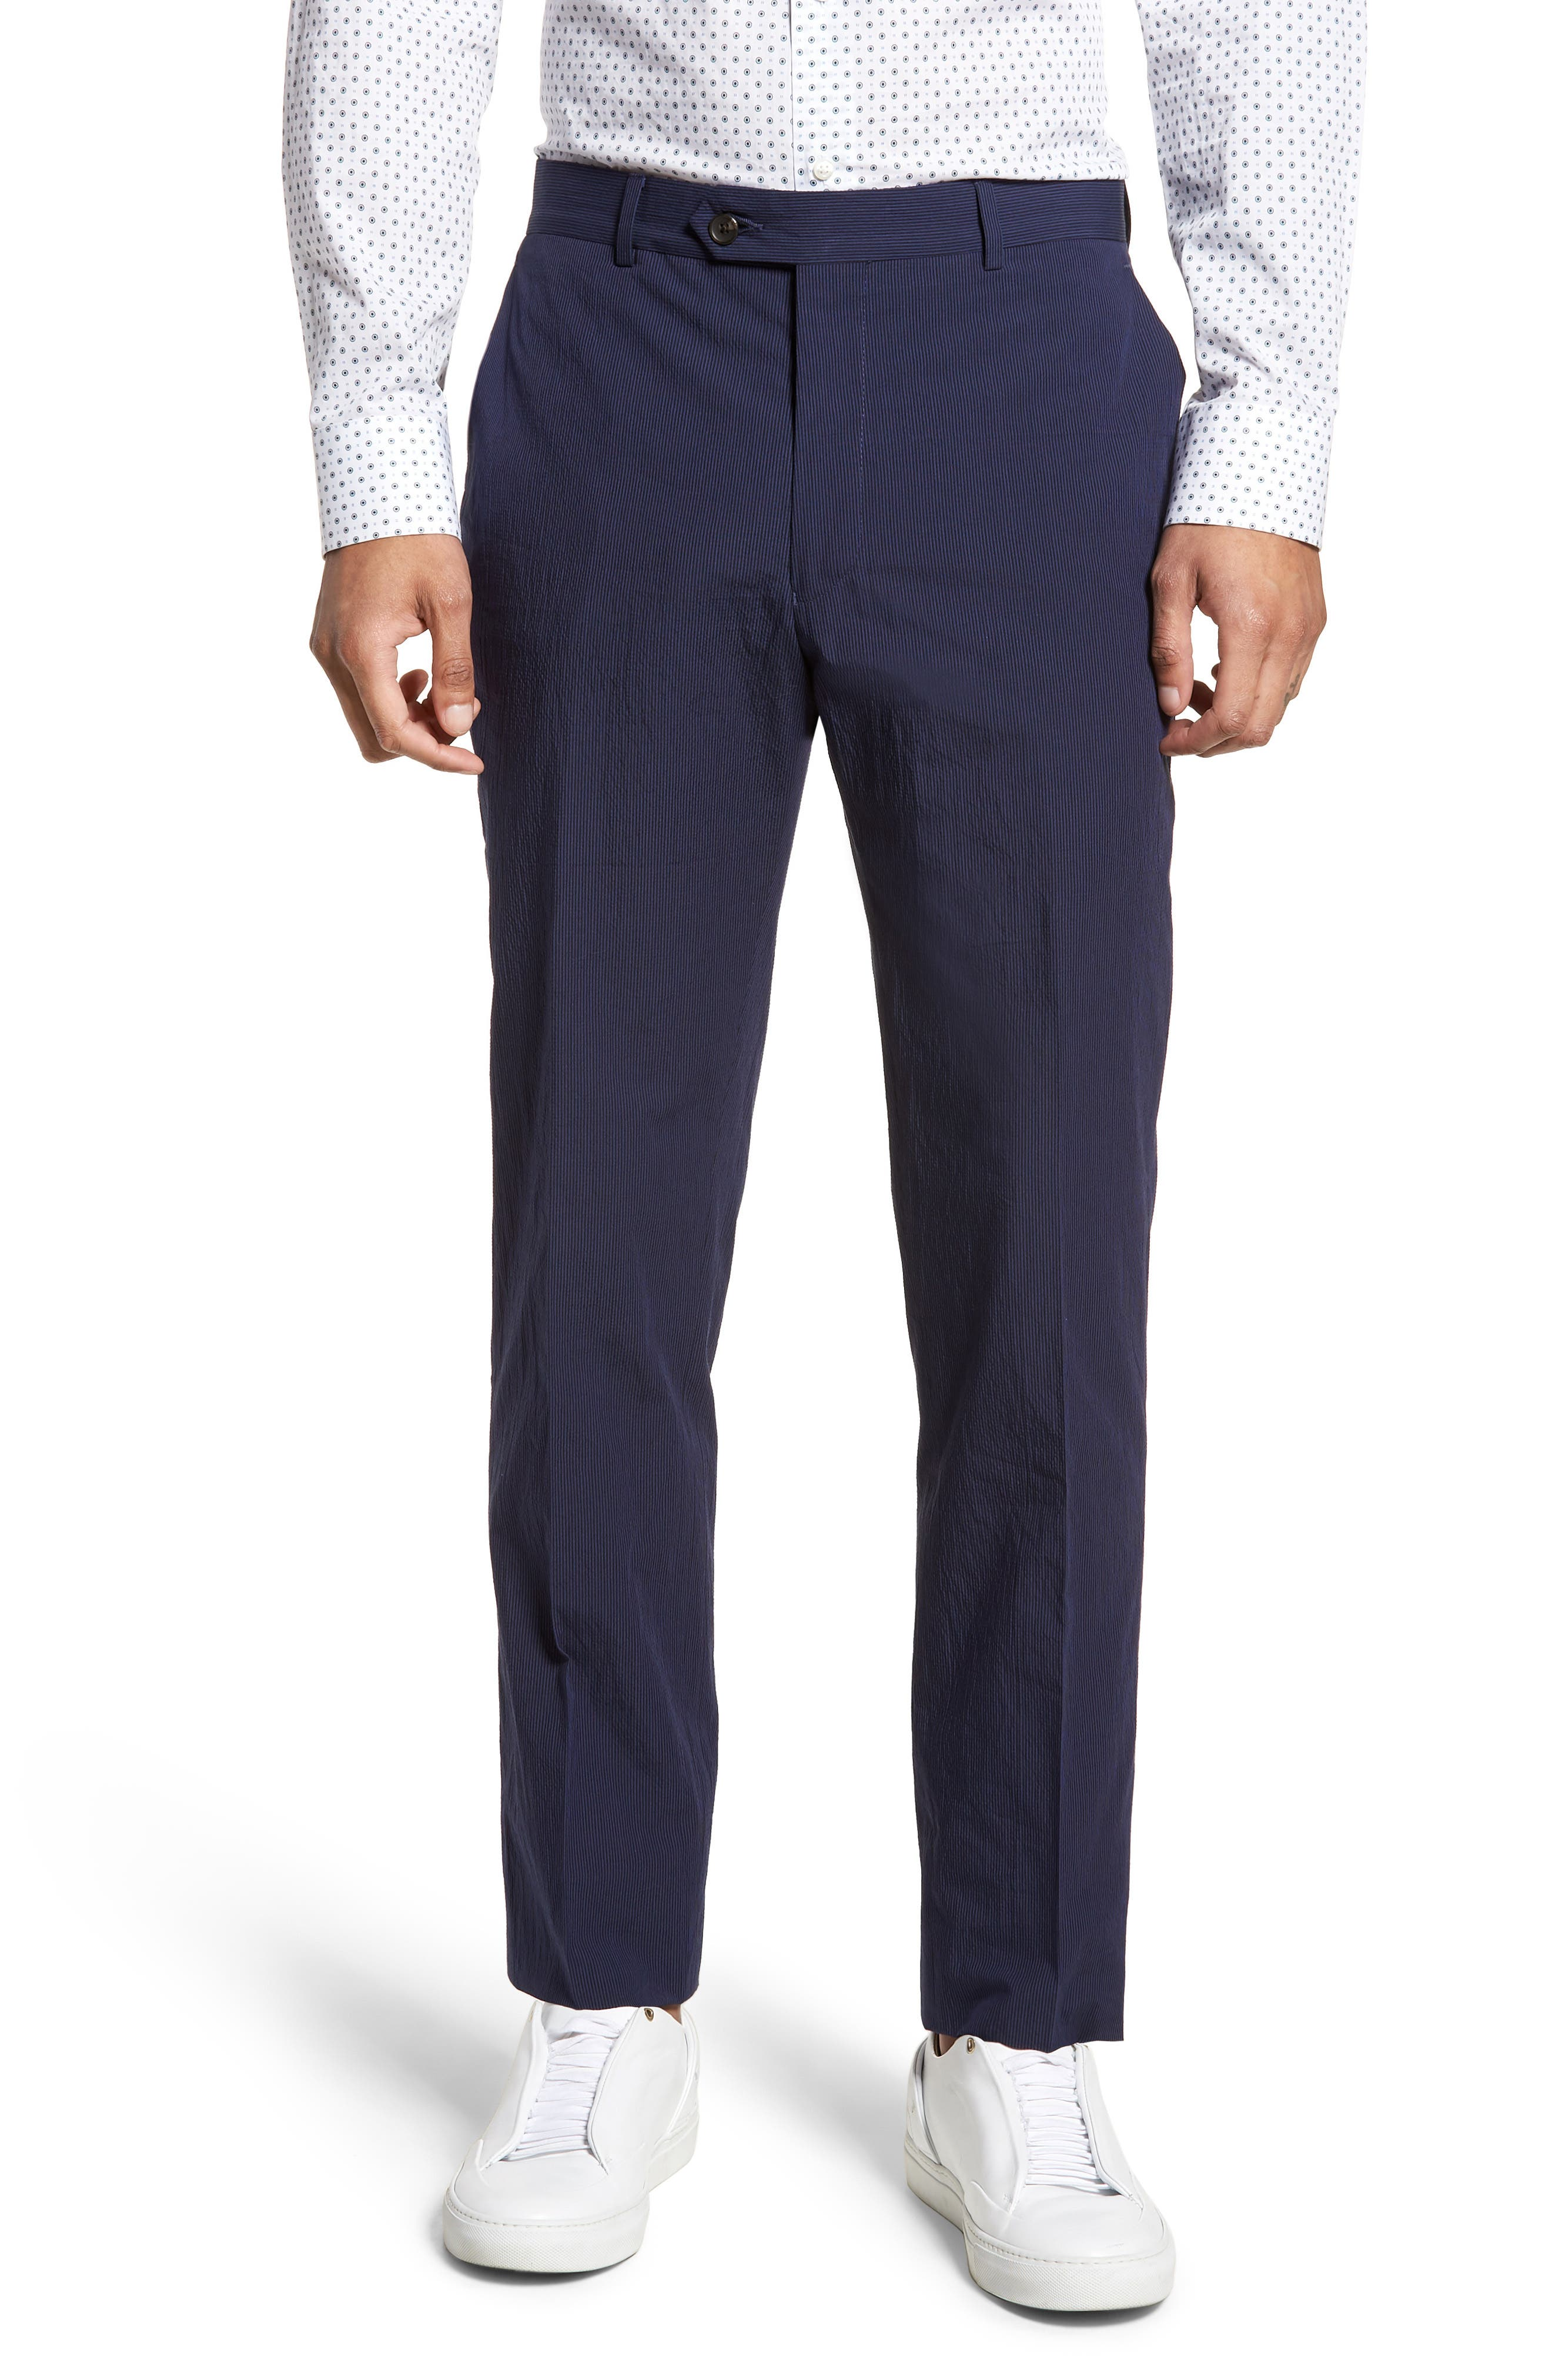 Dagger Flat Front Seersucker Trousers,                             Main thumbnail 1, color,                             400